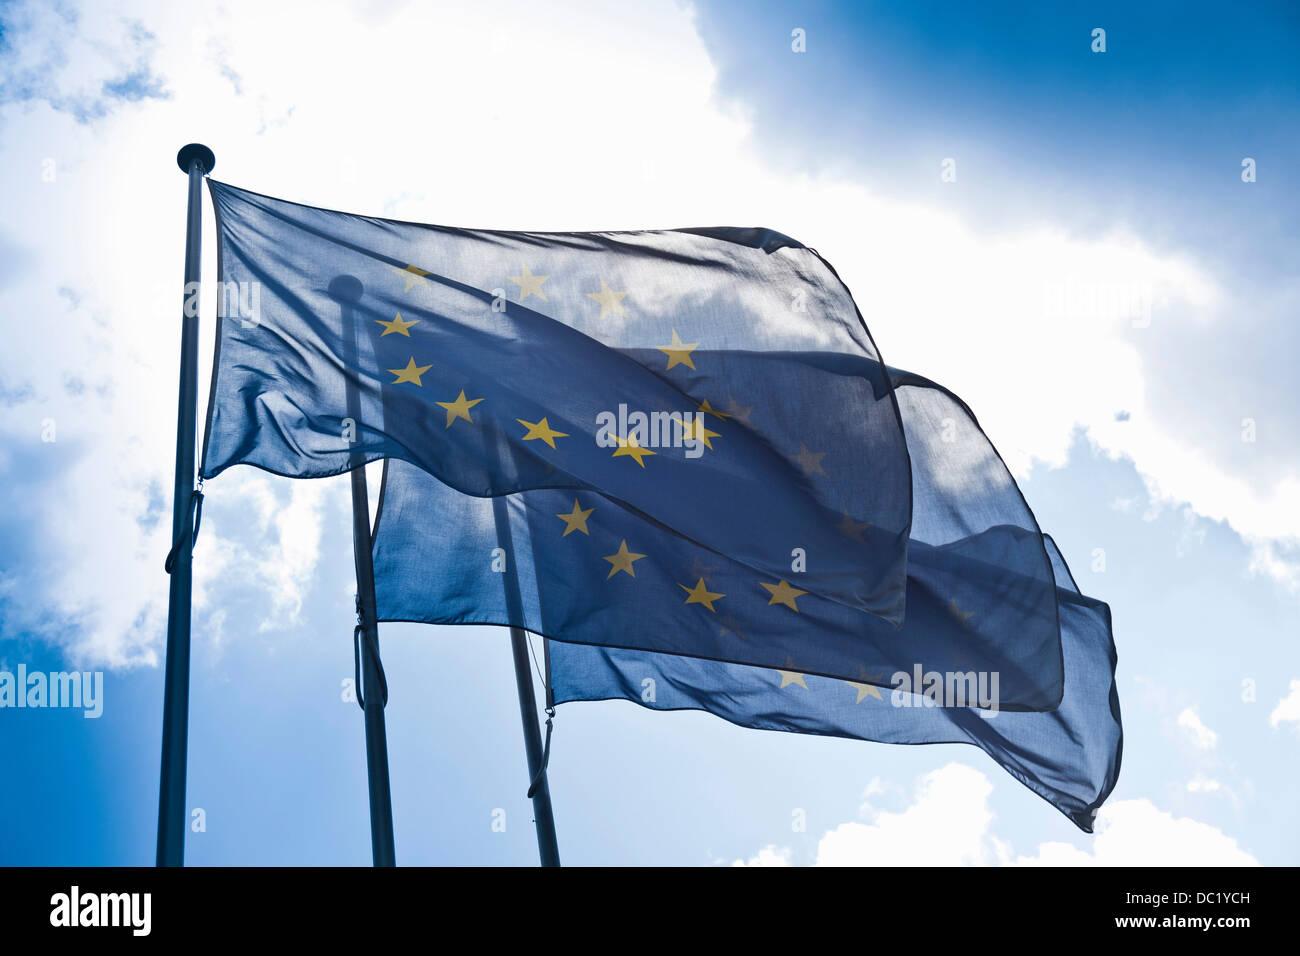 European community flags - Stock Image